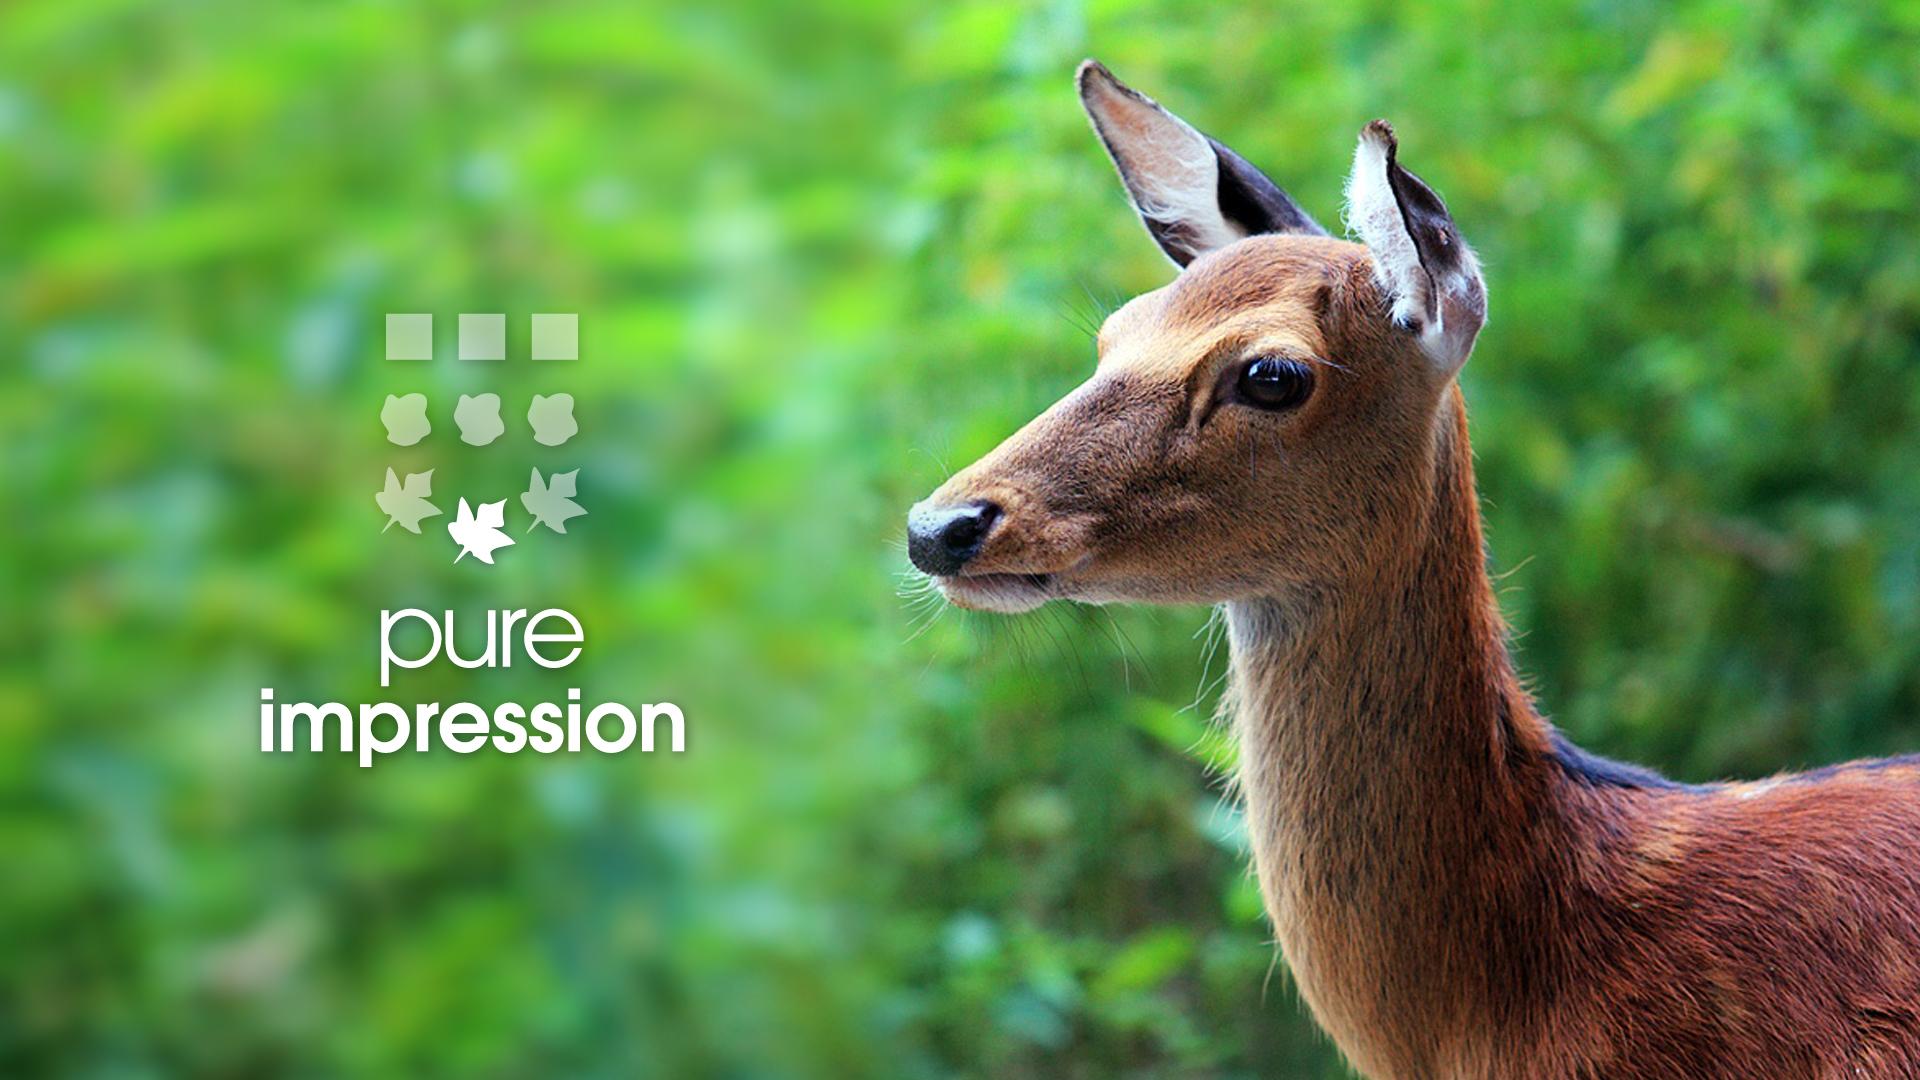 pure-impression-creation-campagne-eveiller-vos-sens-depliant-brochure-flyer-caconcept-alexis-cretin-graphiste-montpellier